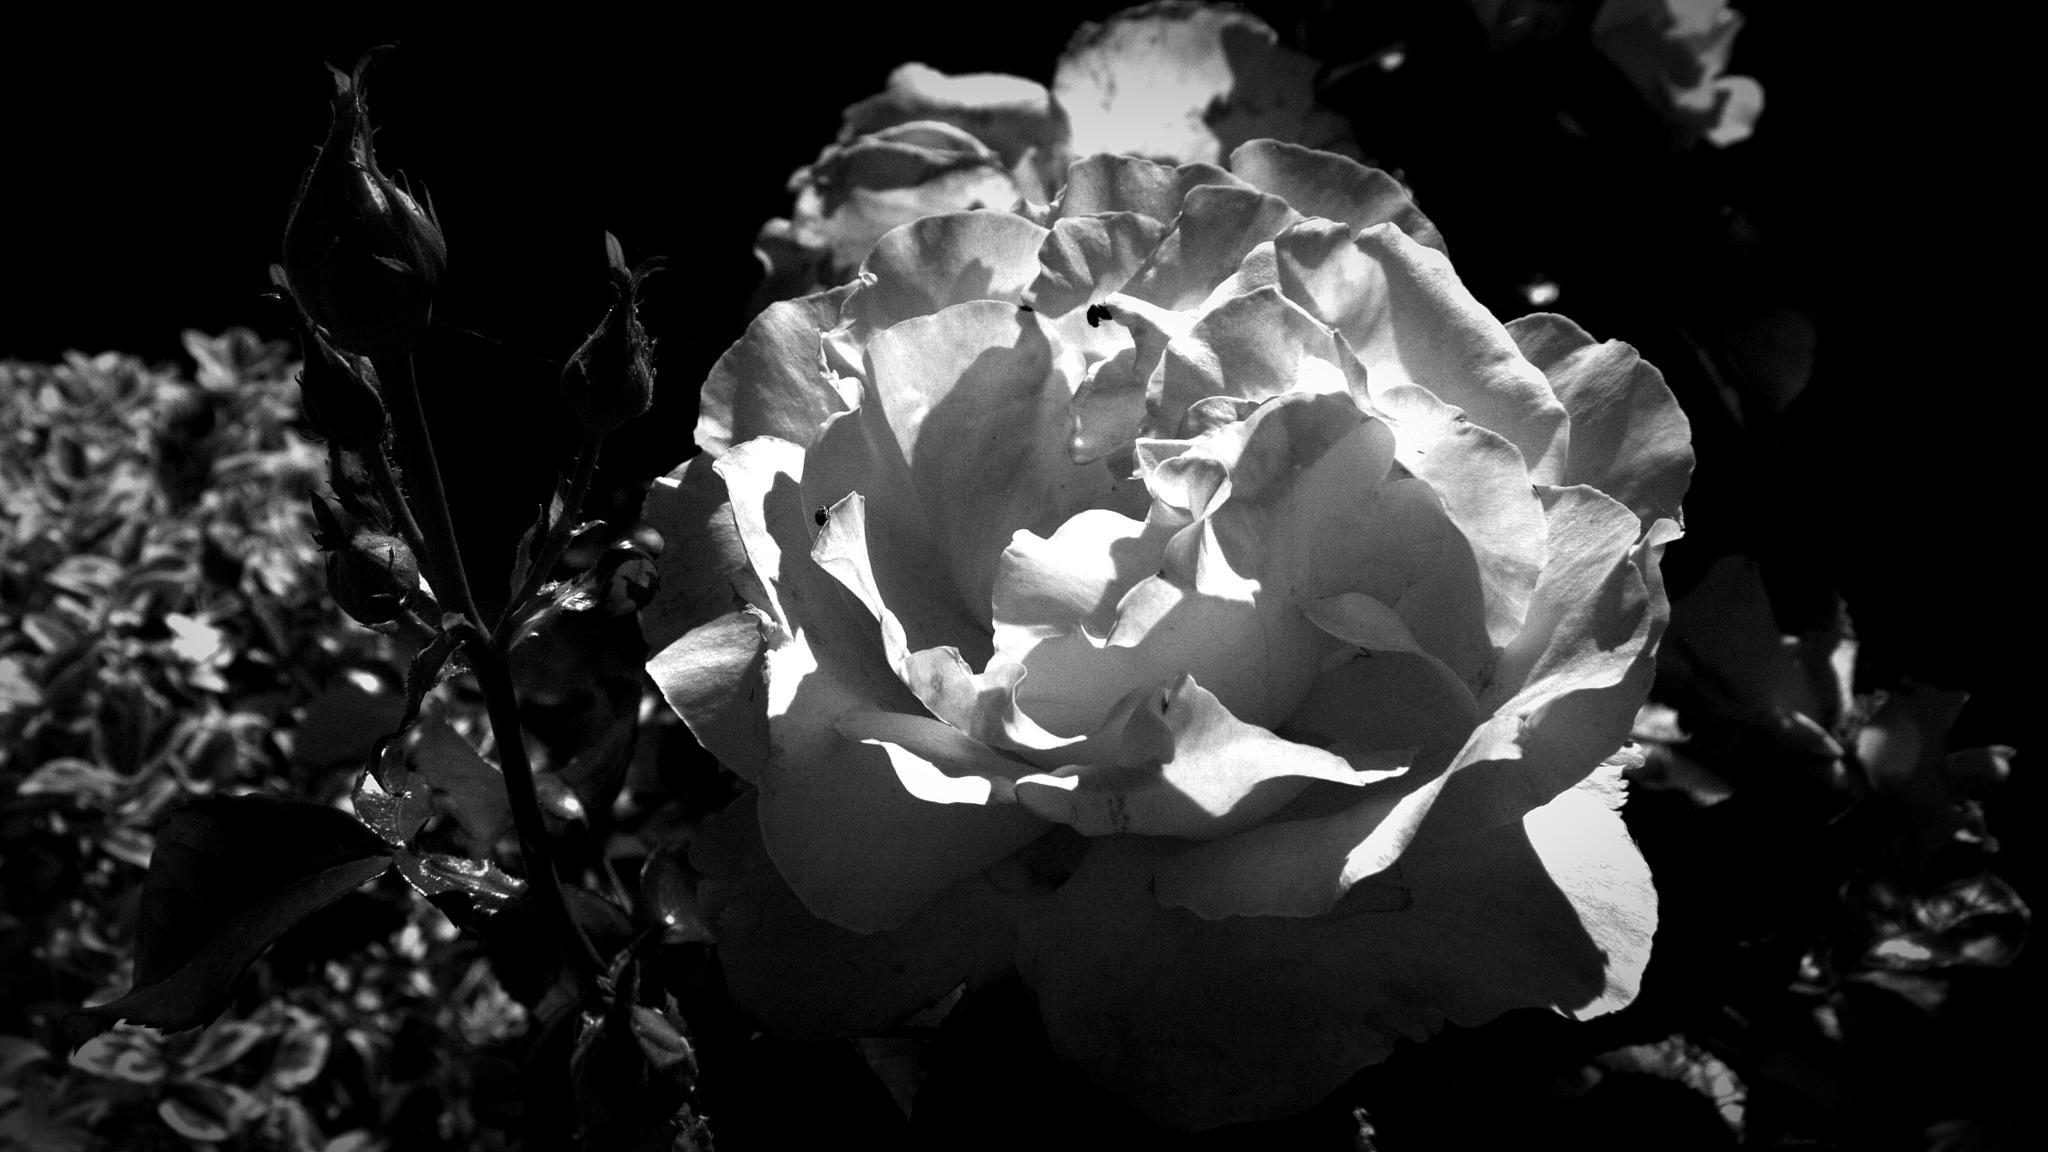 Just A Photograph 353 by Dorian Stretton